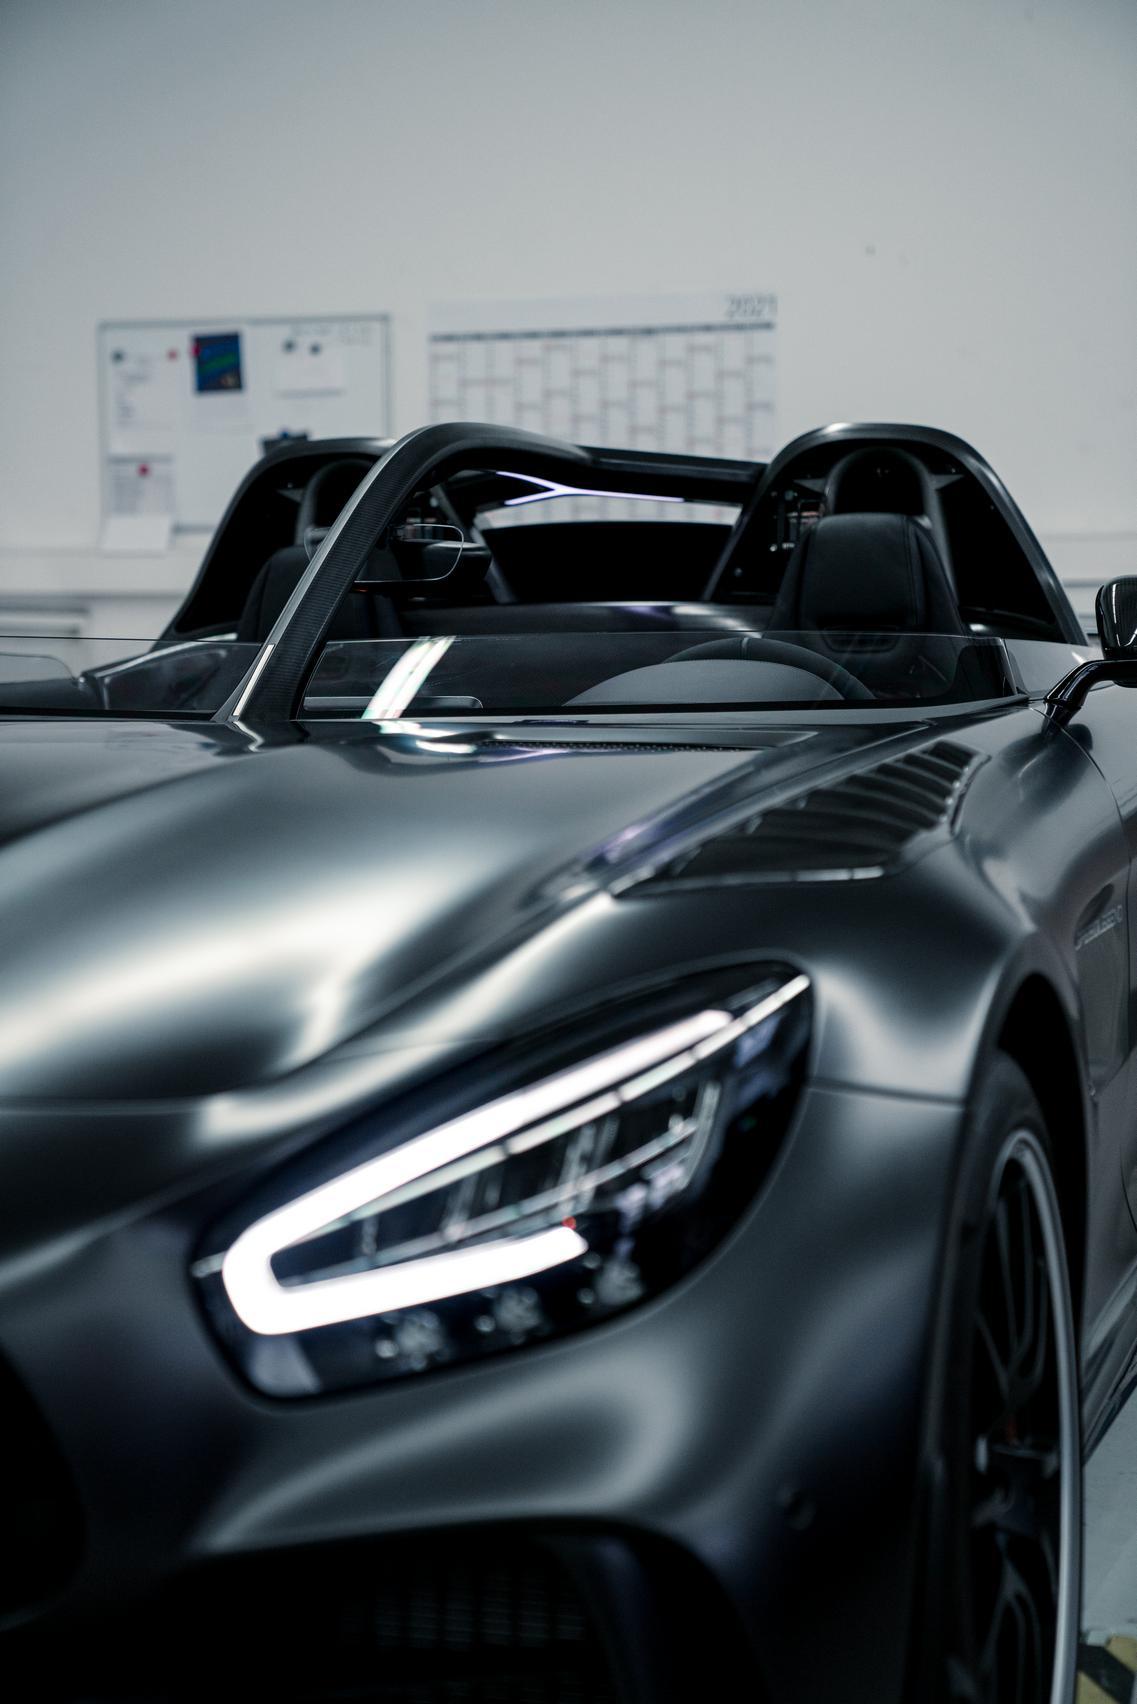 GT R headlight